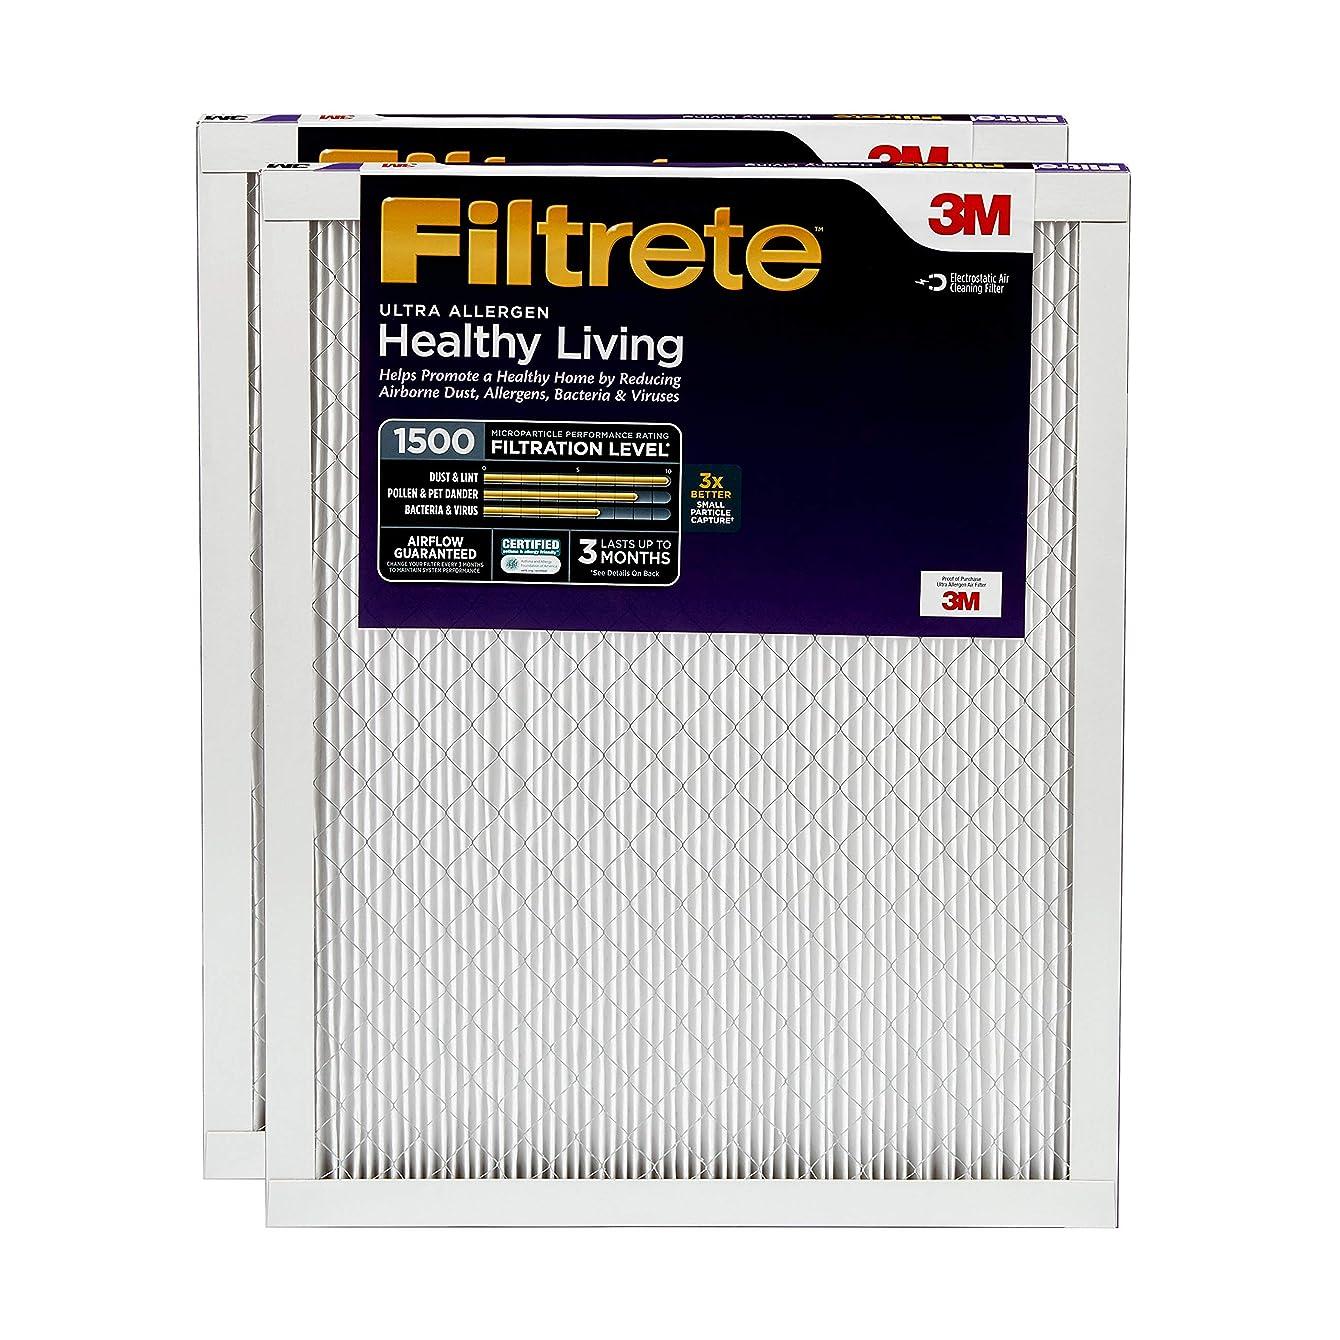 Filtrete 24x24x1, AC Furnace Air Filter, MPR 1500, Healthy Living Ultra Allergen, 2-Pack